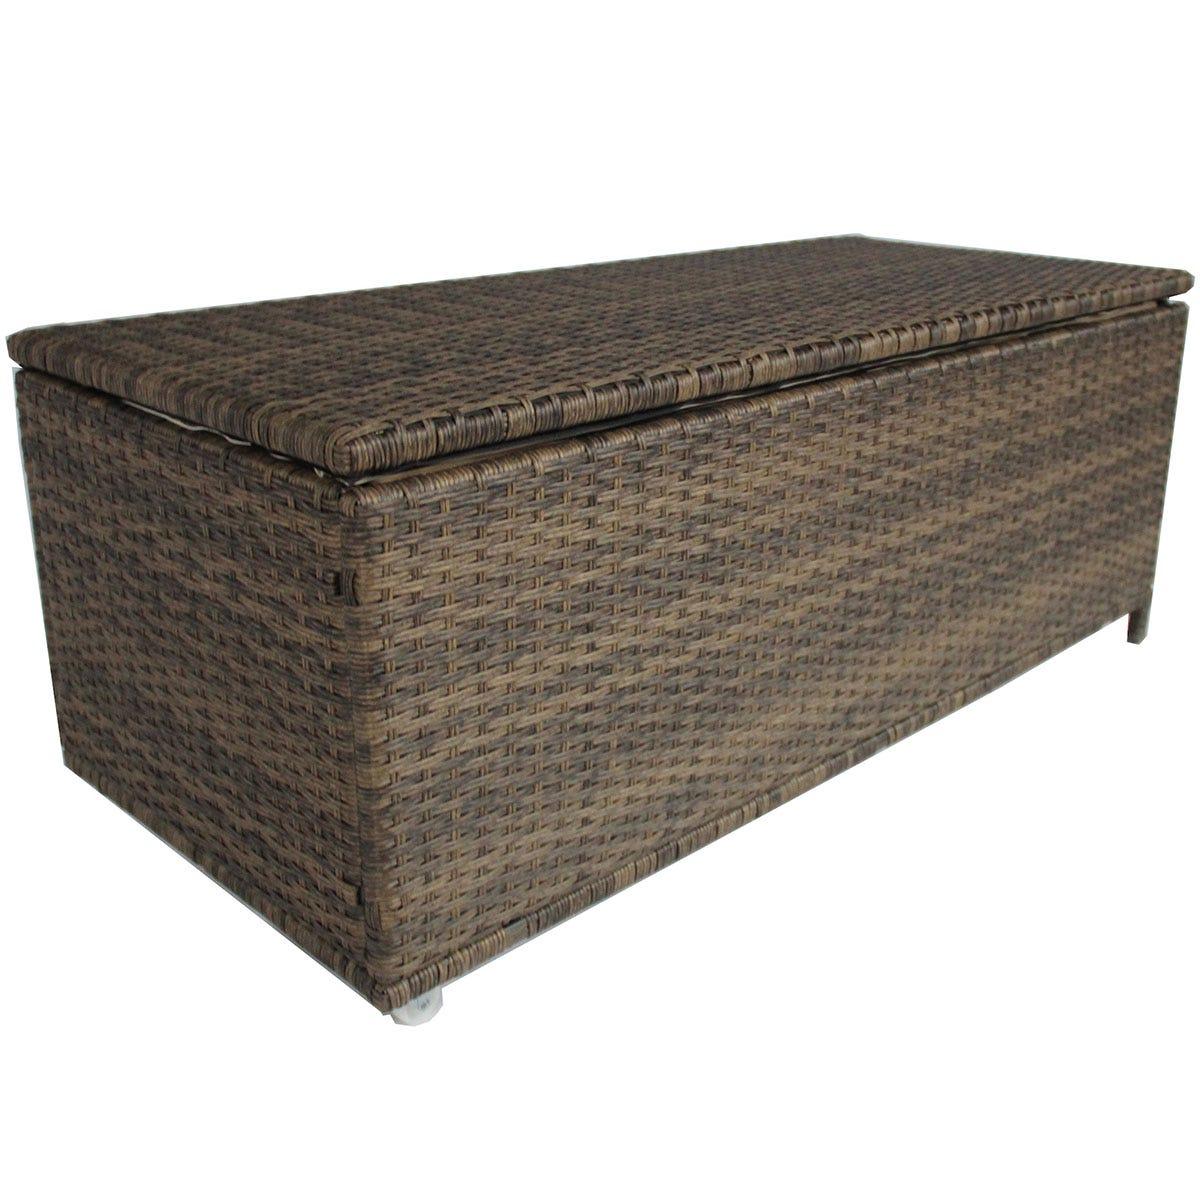 Charles Bentley Rattan Storage Box - Natural